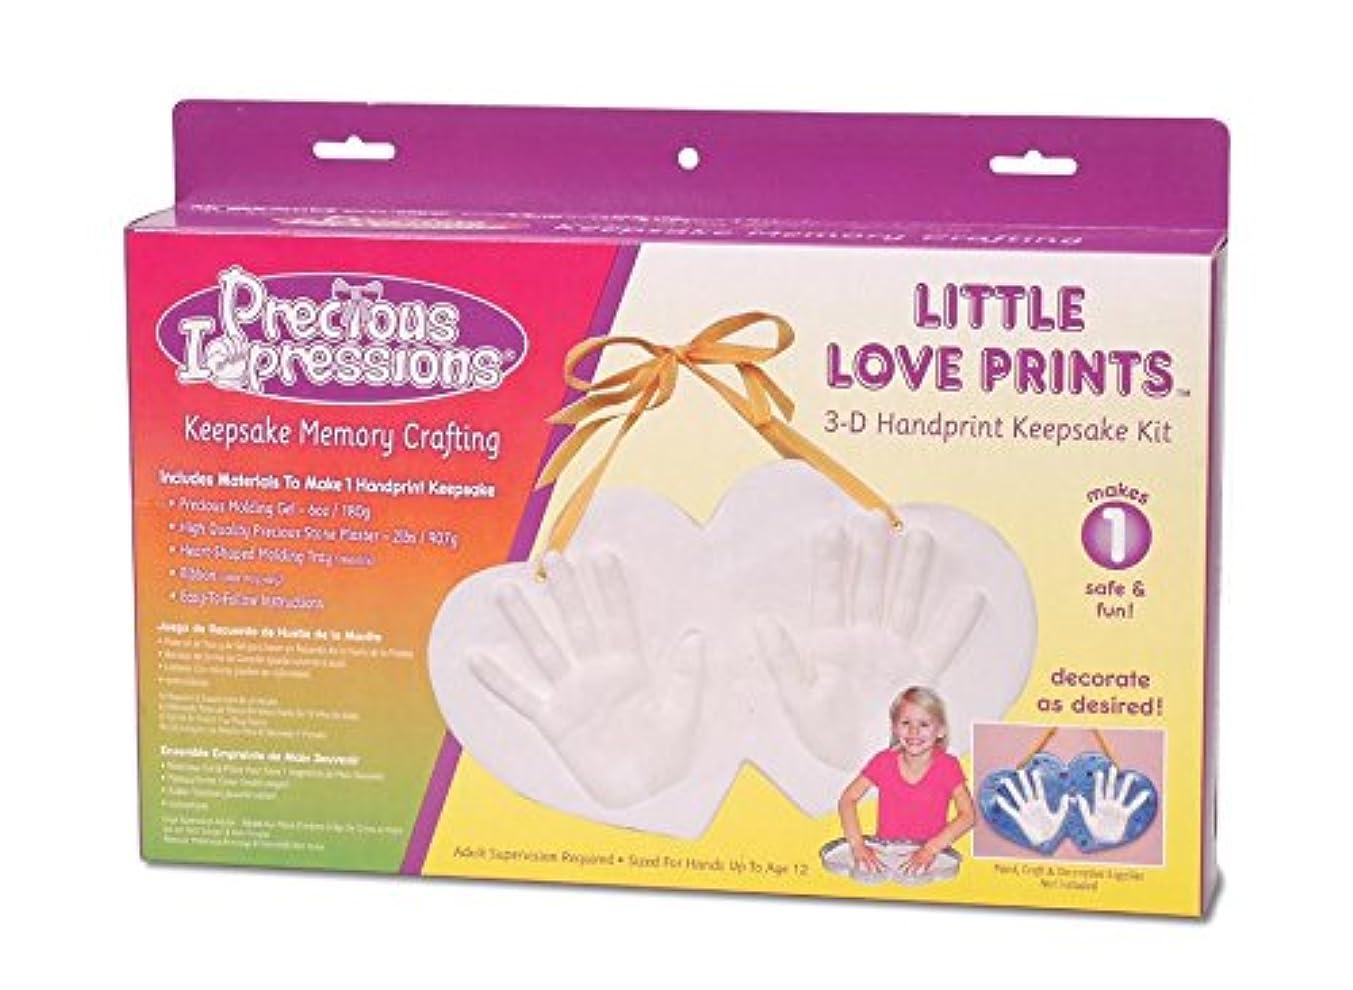 Darice Precious Impressions - Little Loves Handprint 3-D Kit